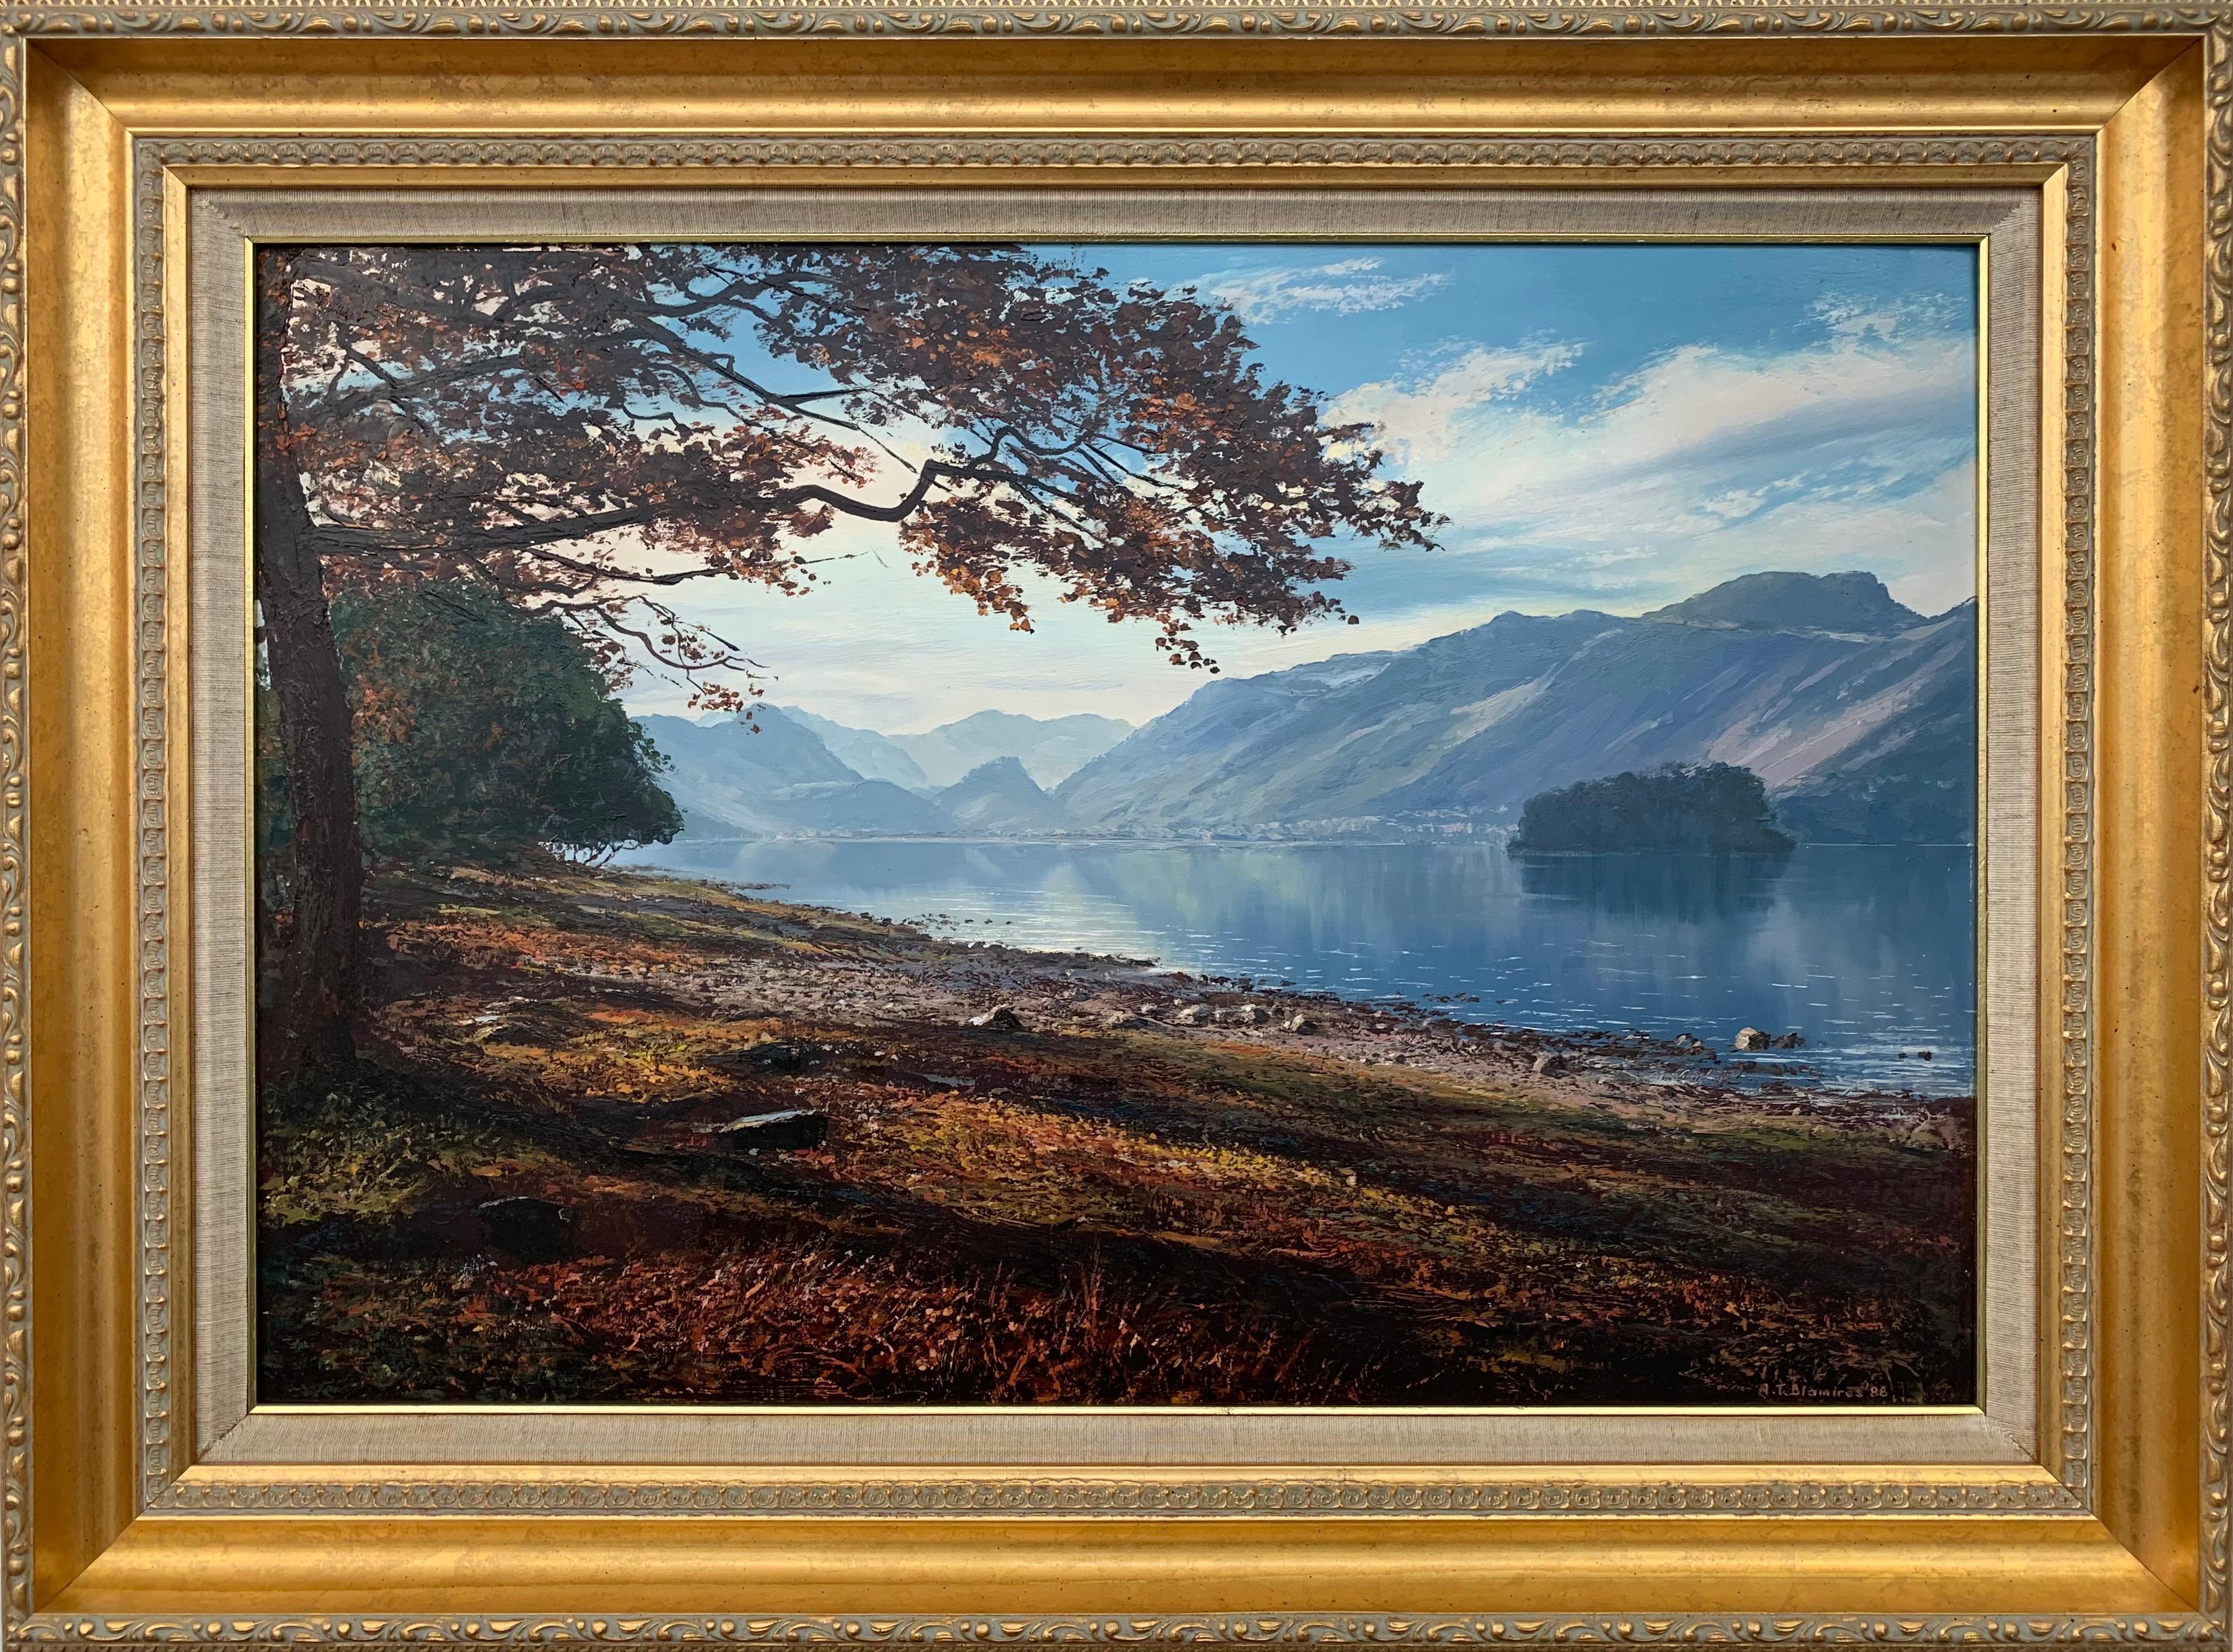 Borrowdale & Scafell in English Lake District by Modern British Landscape Artist